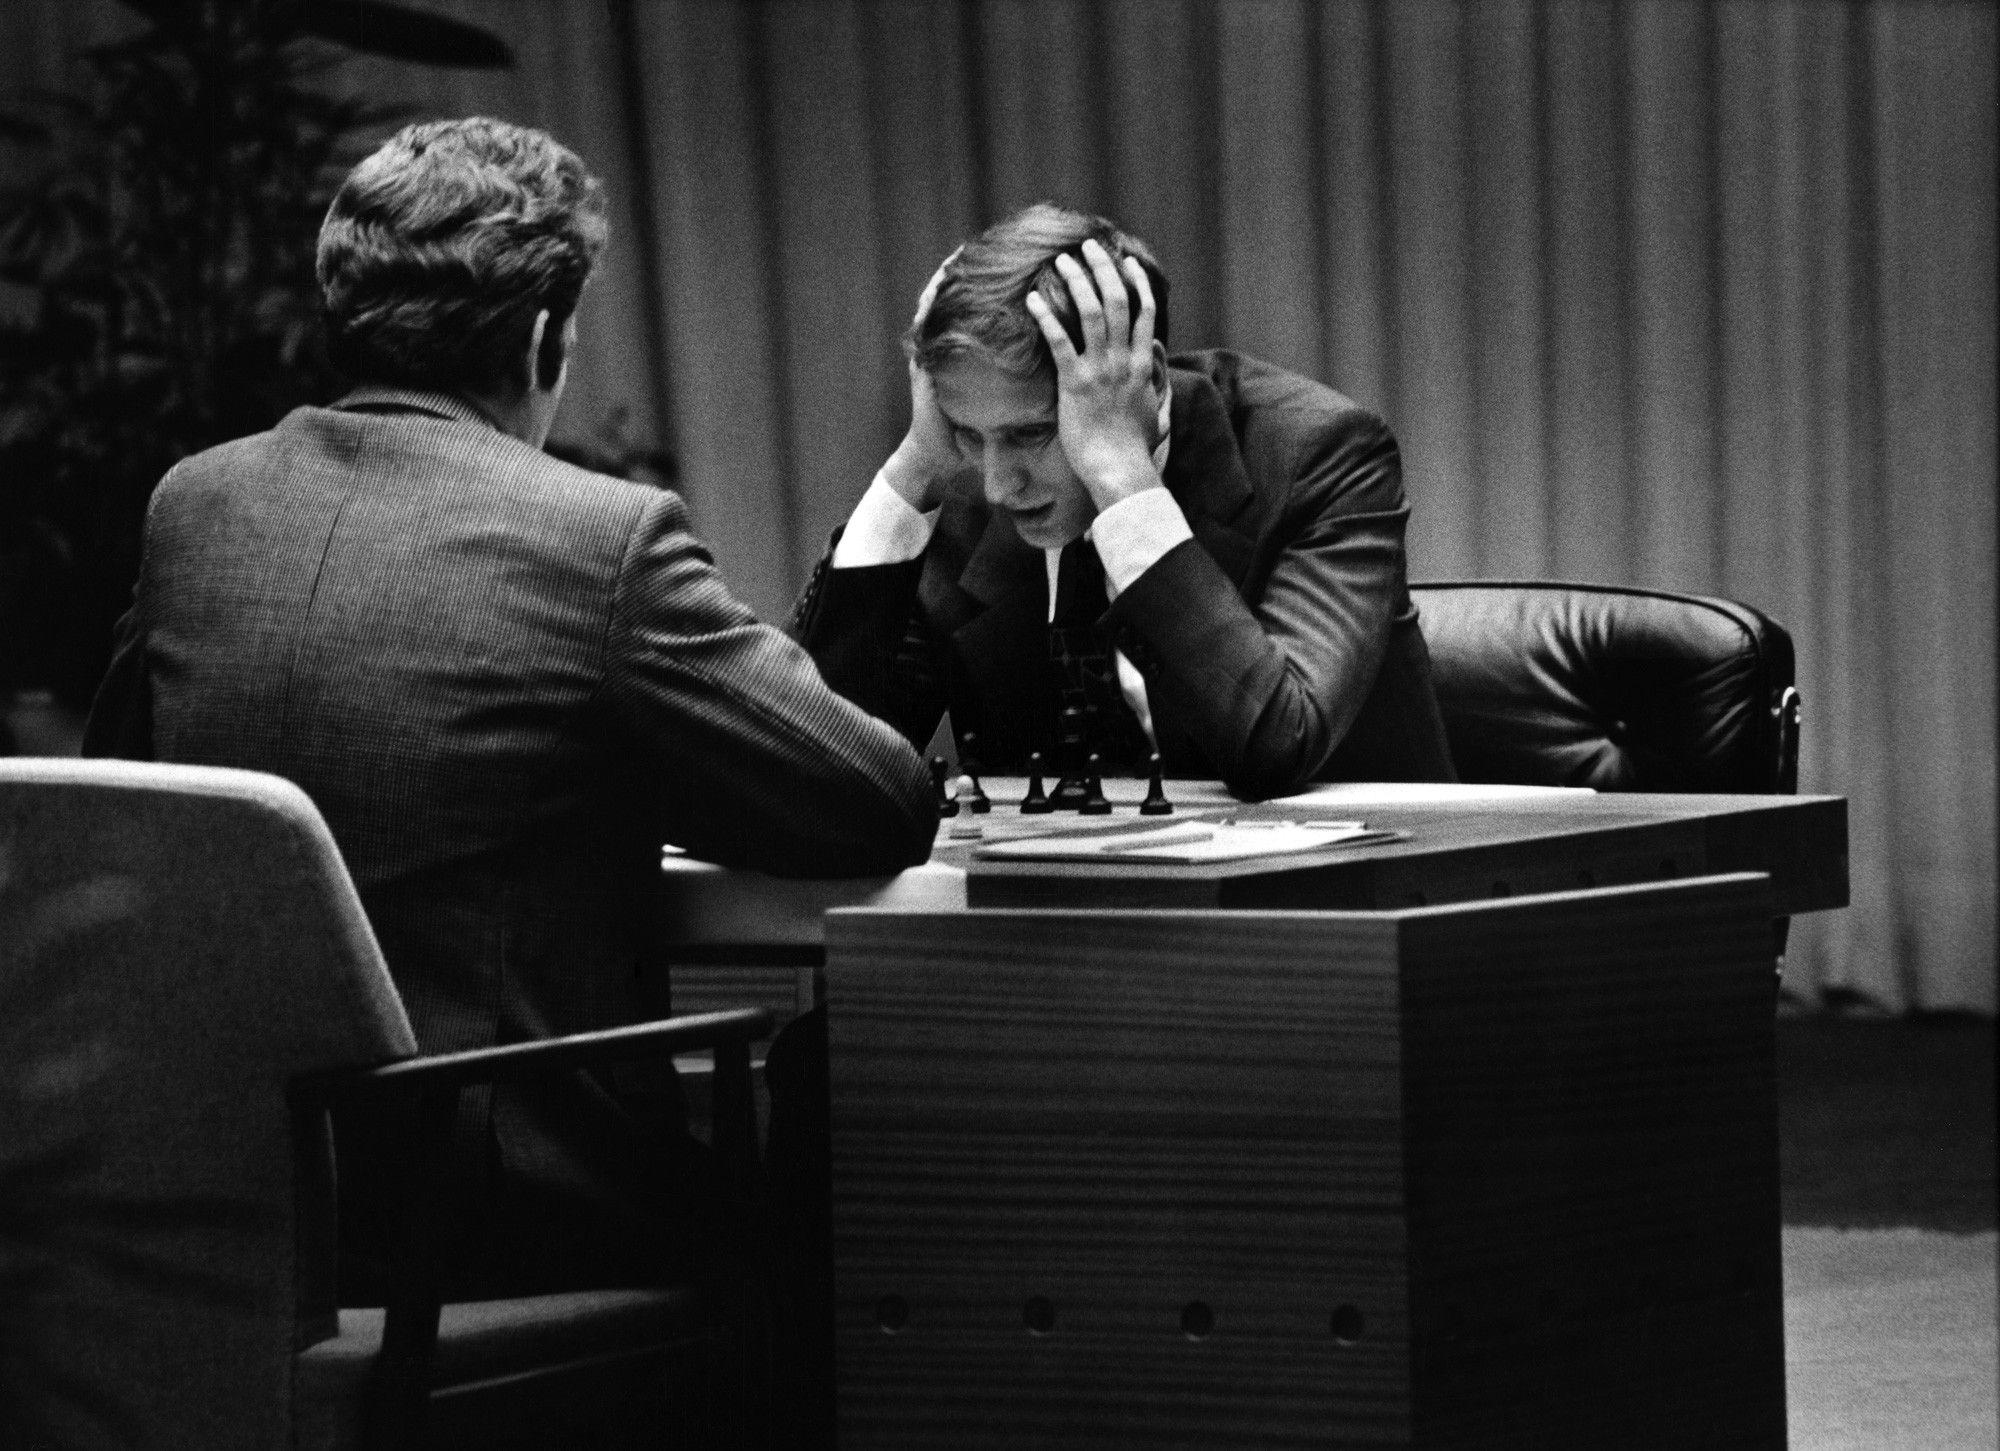 Bobby Fischer Vs. Boris Spassky Game 6, World Chess Championship, Reykjavík, Iceland 1972